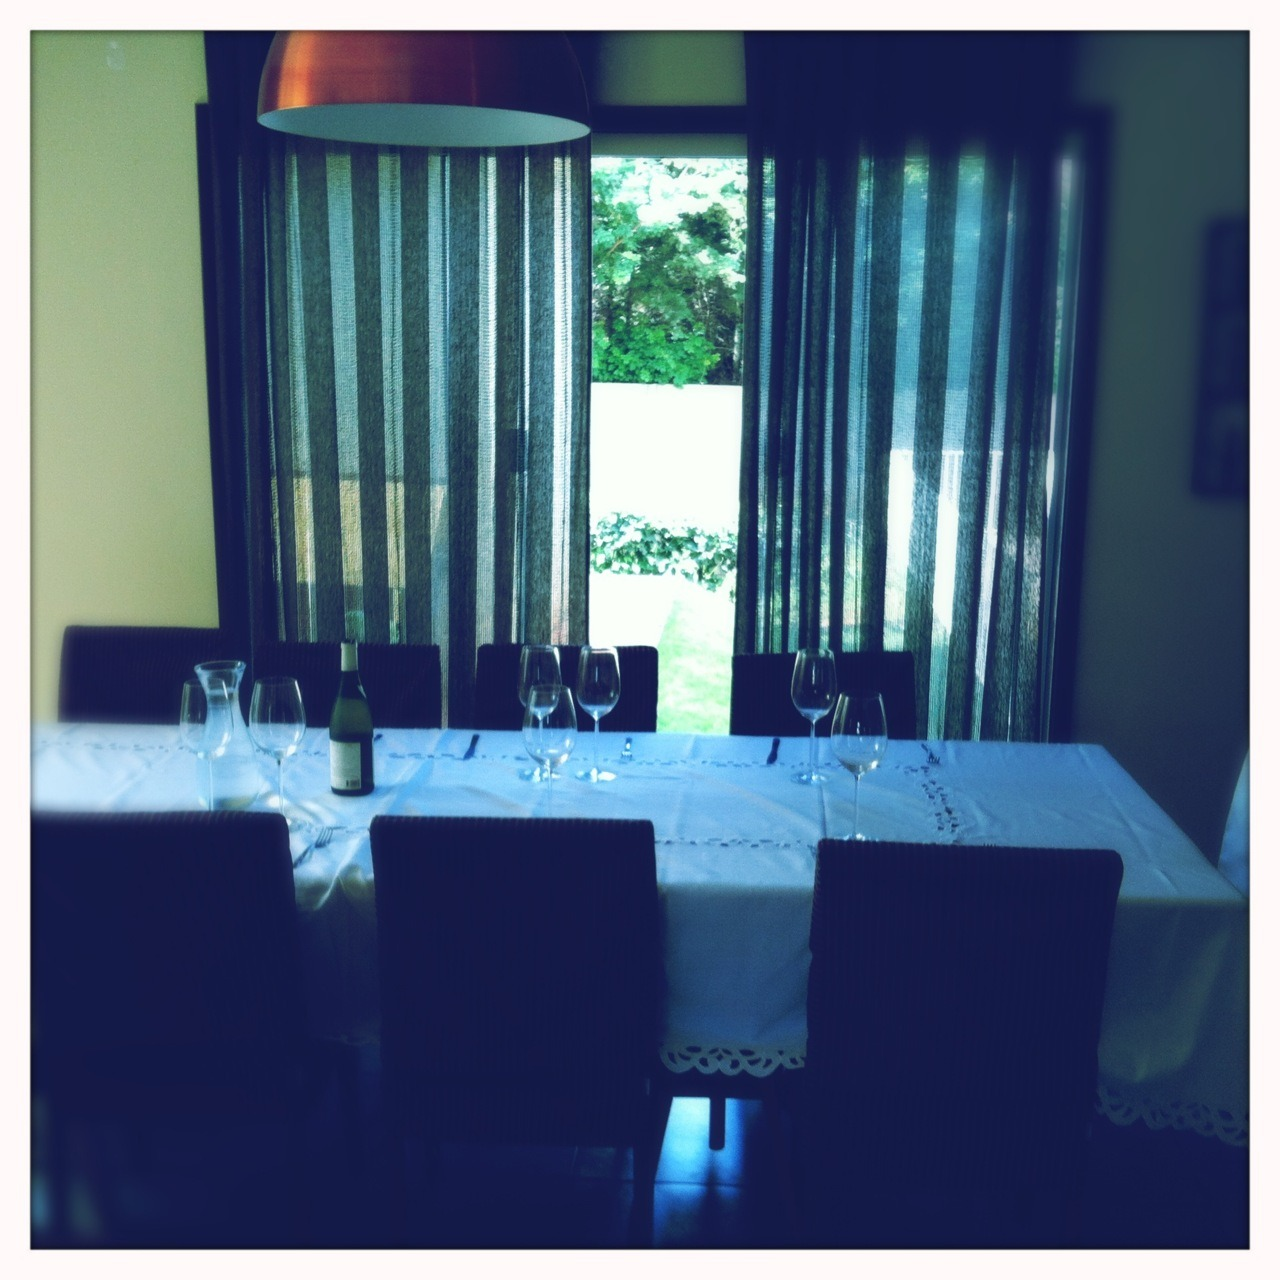 La table est prêt pour là dégustation   Americana Lens, Blanko Film, No Flash, Taken with  Hipstamatic